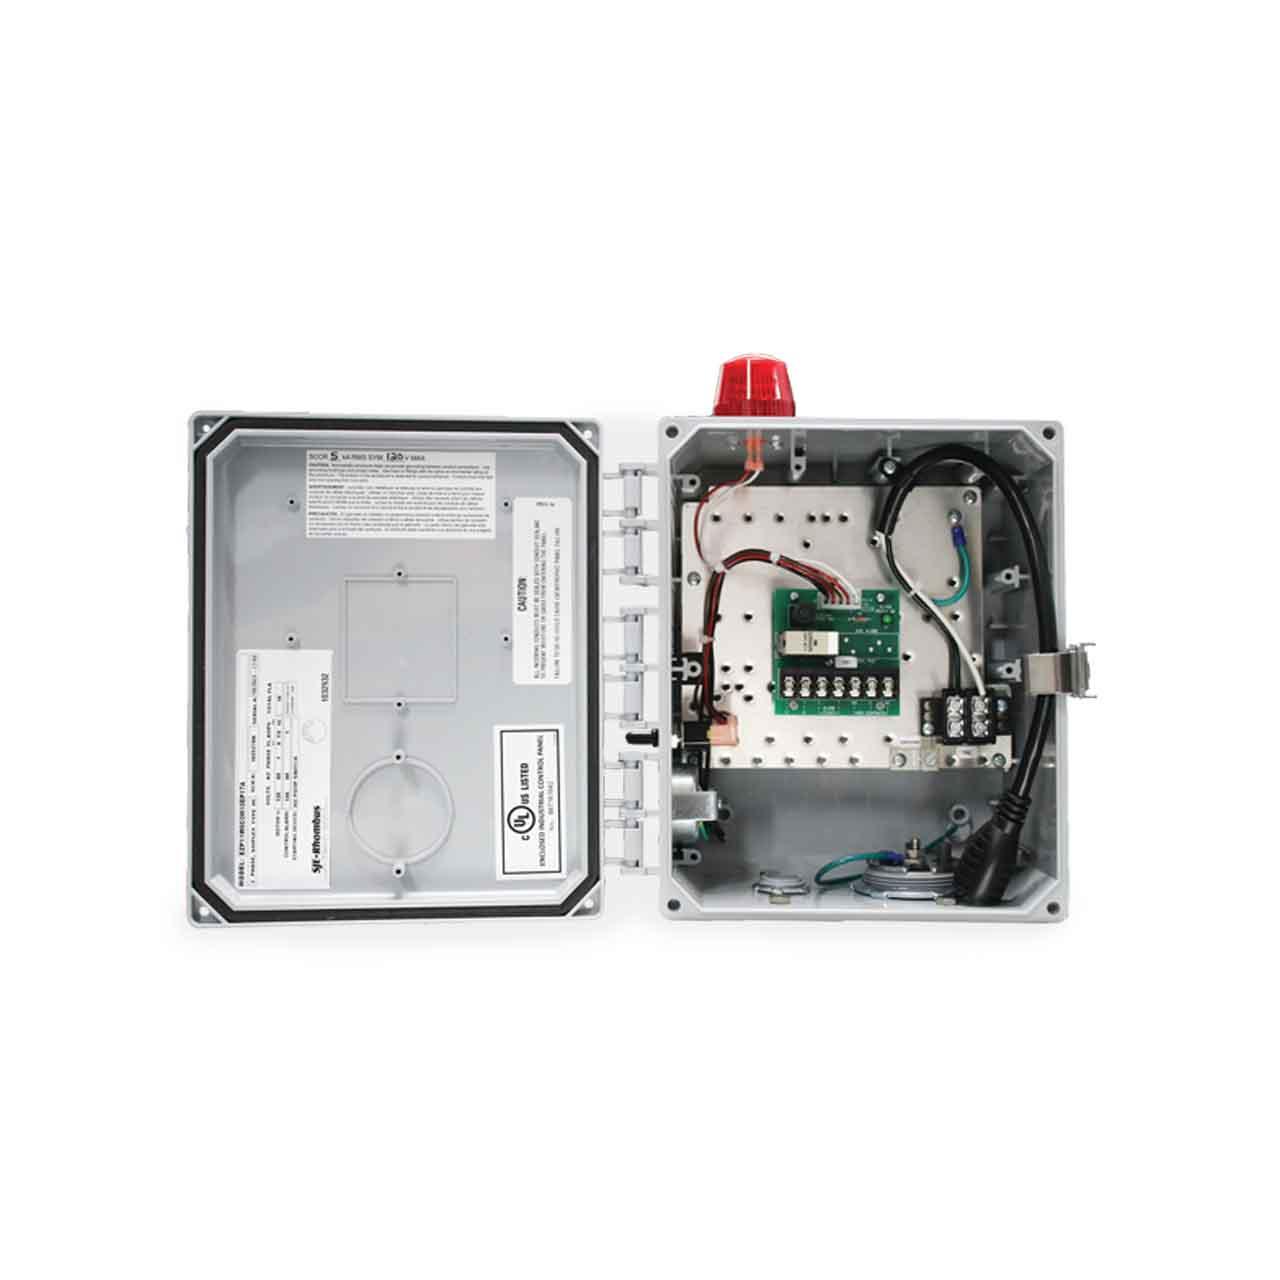 medium resolution of sje rhombus sje rhombus ezp series plugger plug in pump control rhombus septic control wiring diagram